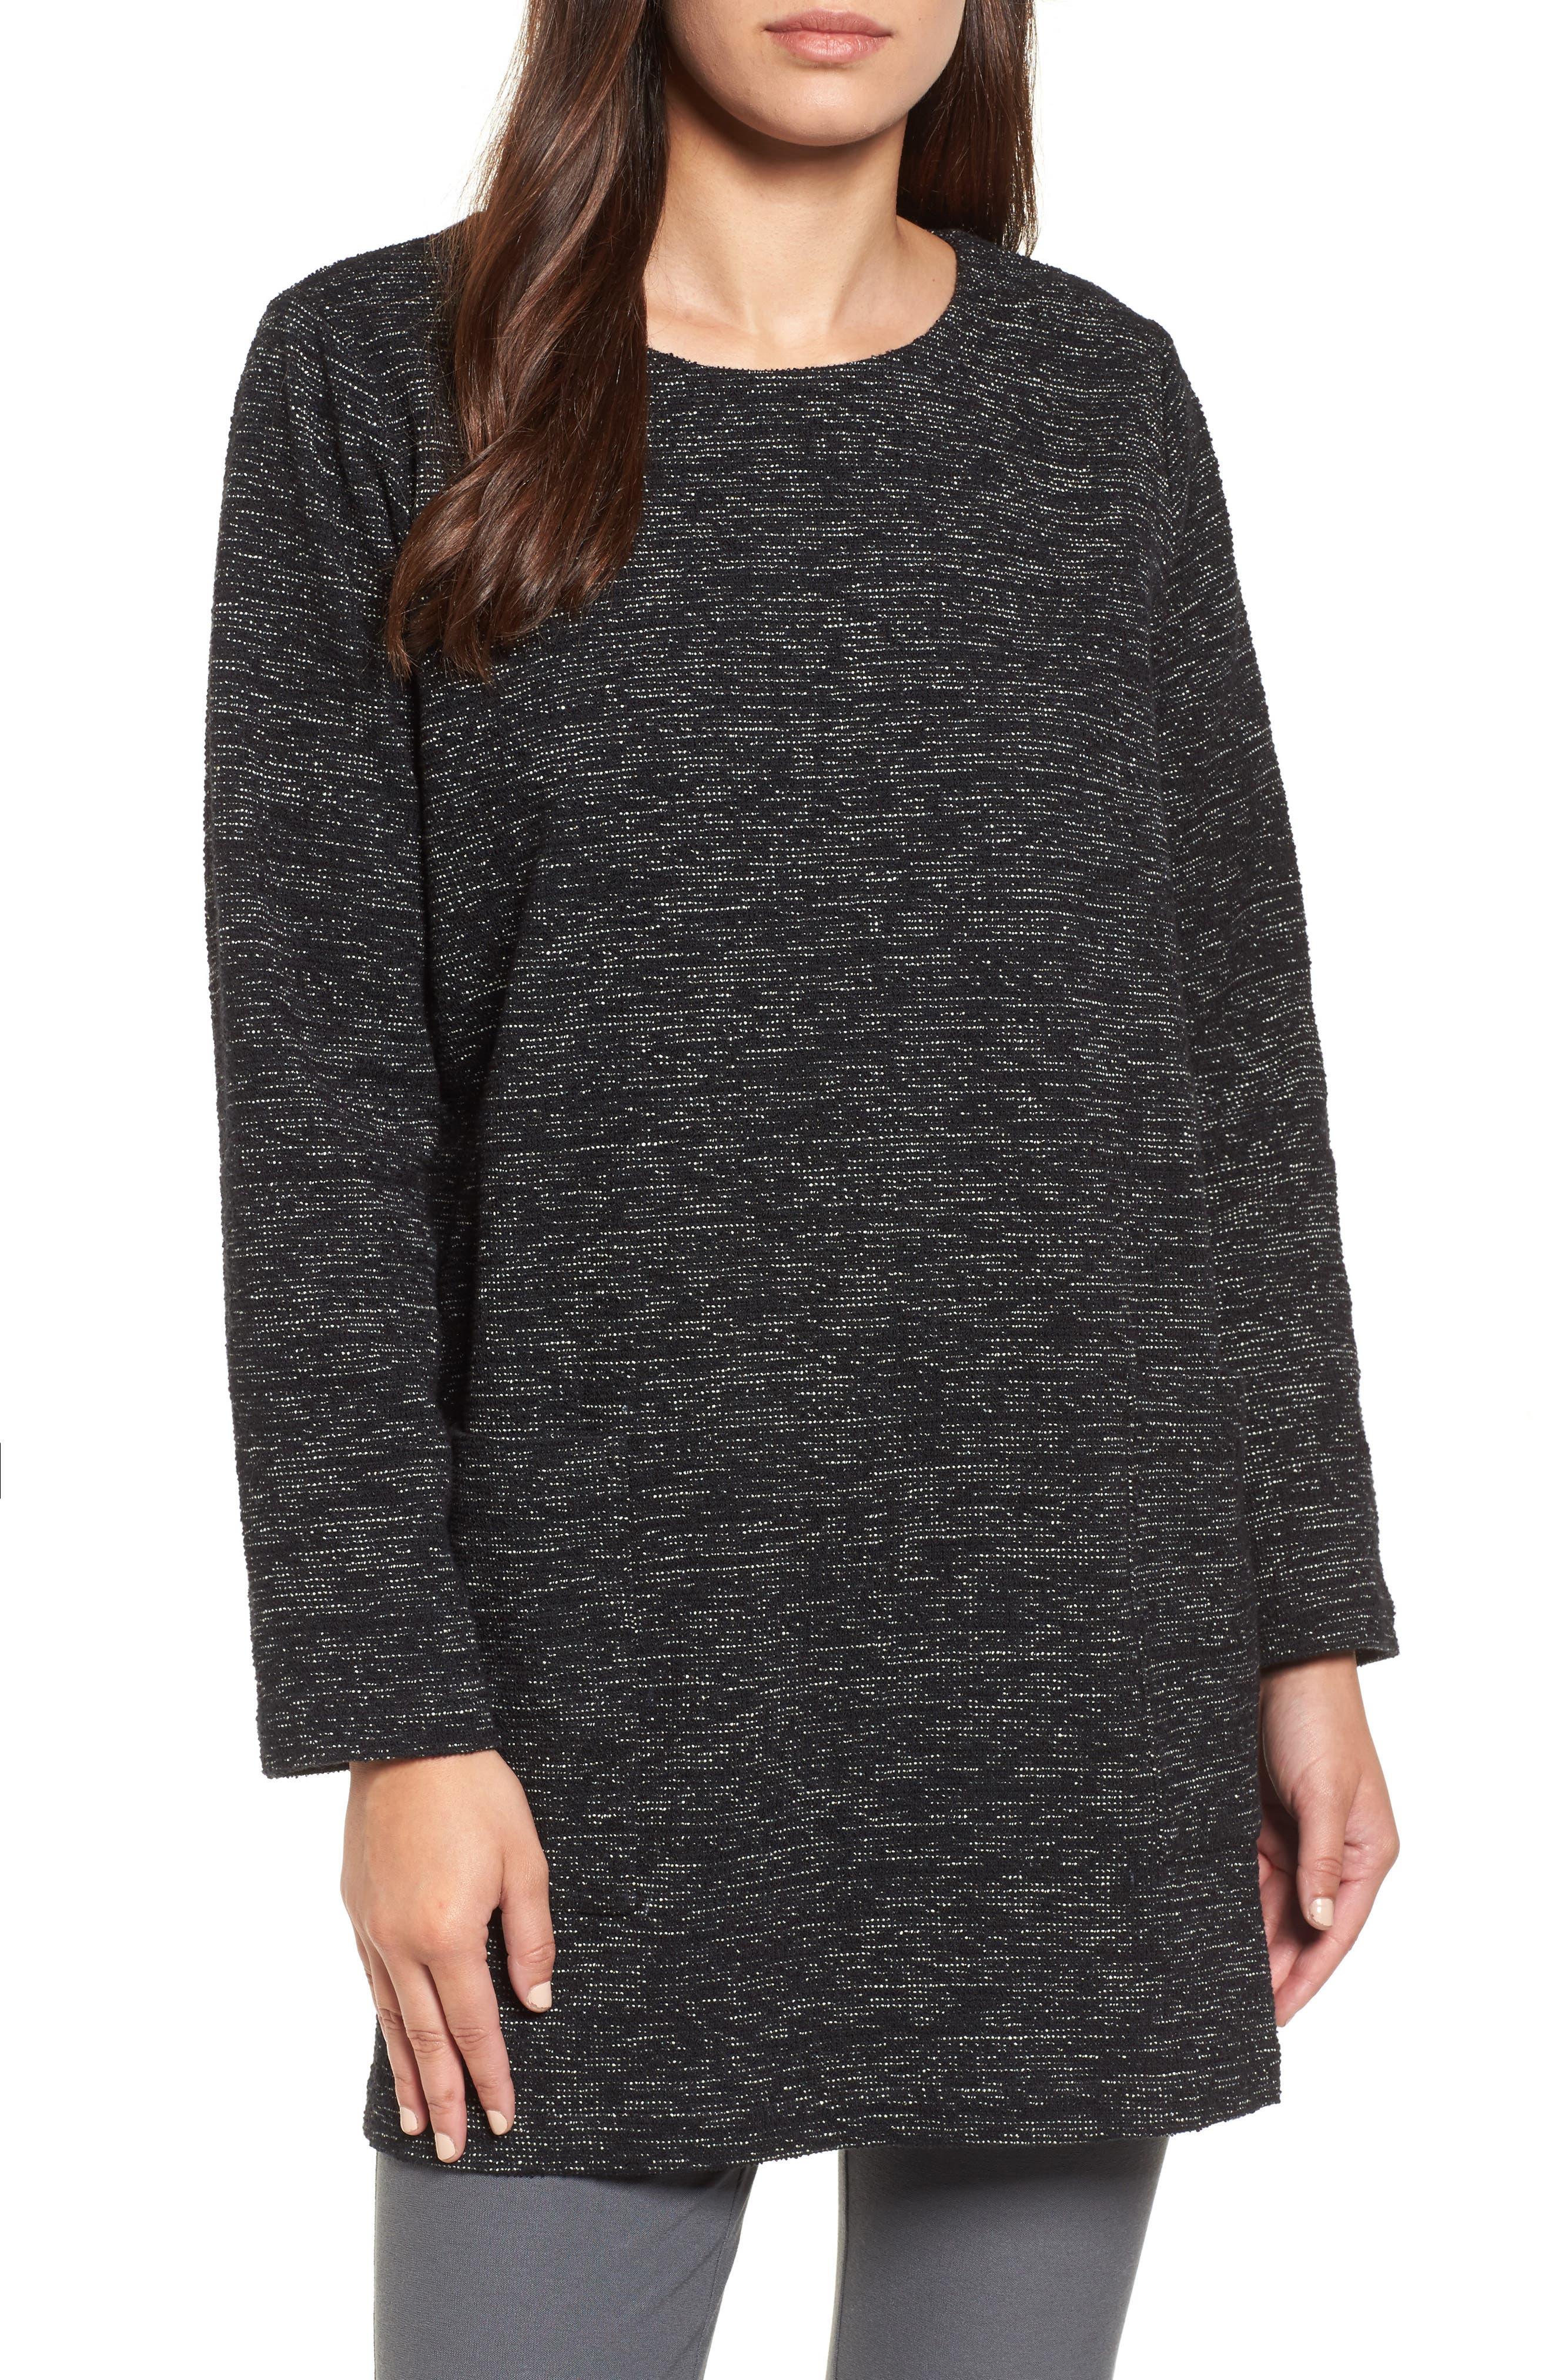 Boxy Organic Cotton Blend Tunic Sweater,                         Main,                         color, Black